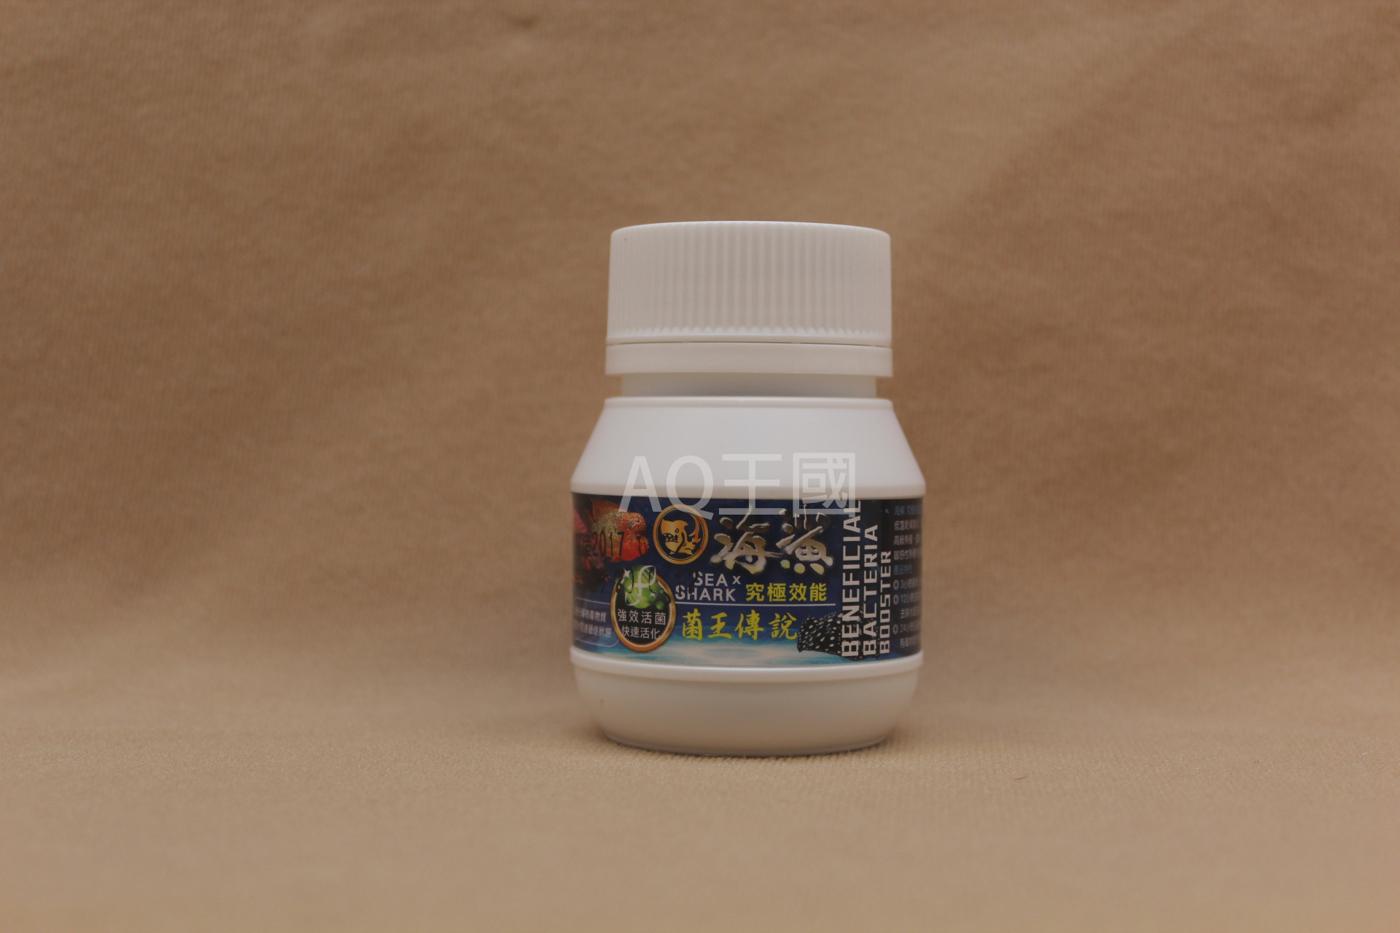 AQ王國海鯊究極效能菌王傳說穩定水質50g粉狀硝化菌魟魚龍魚專用菌粉